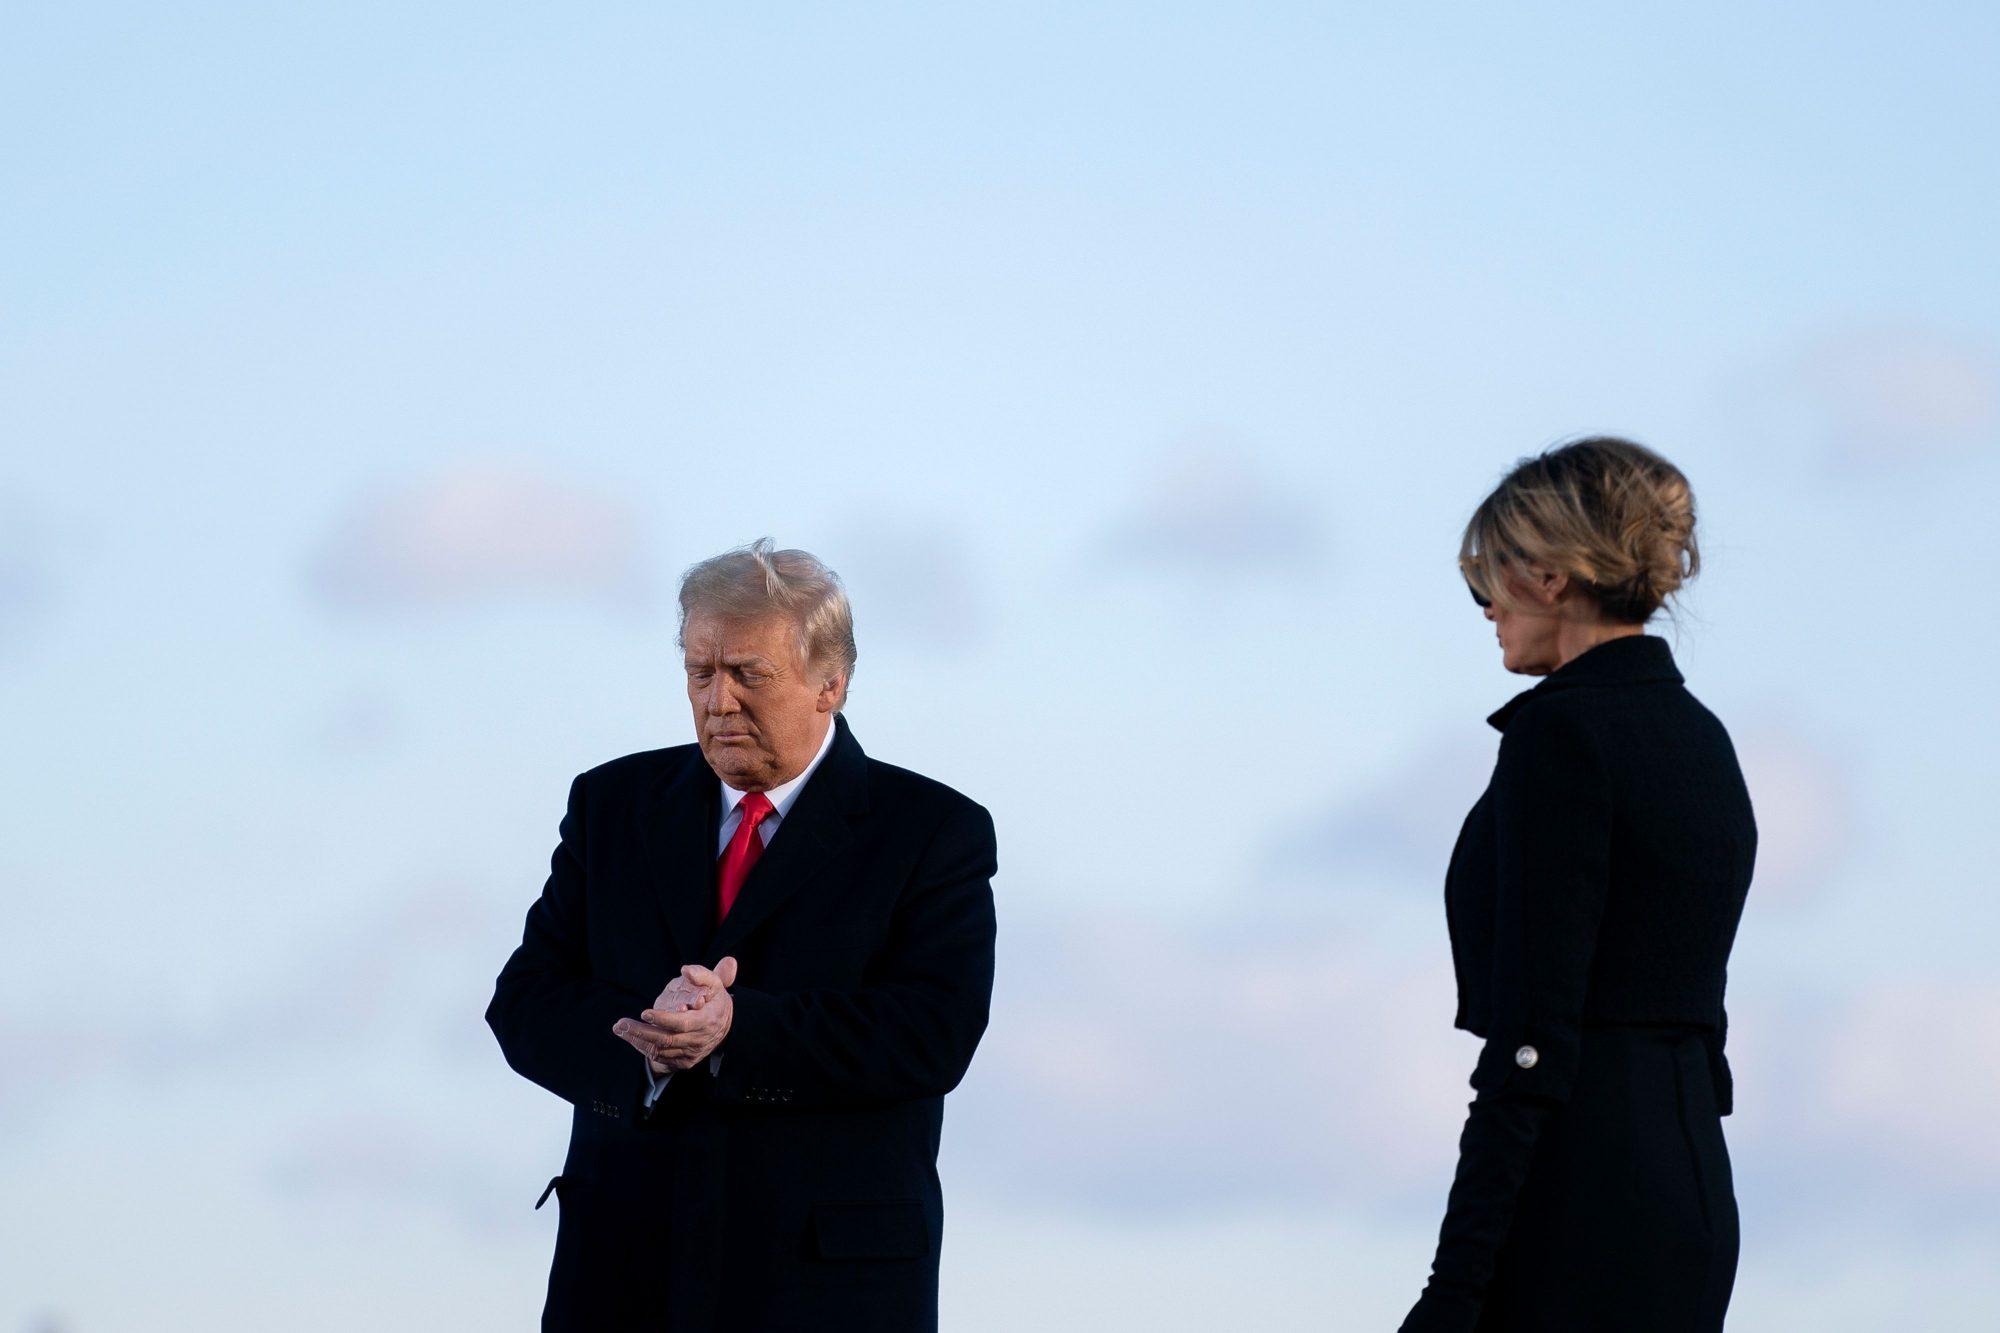 House sends Trump impeachment article to Senate - channel 4